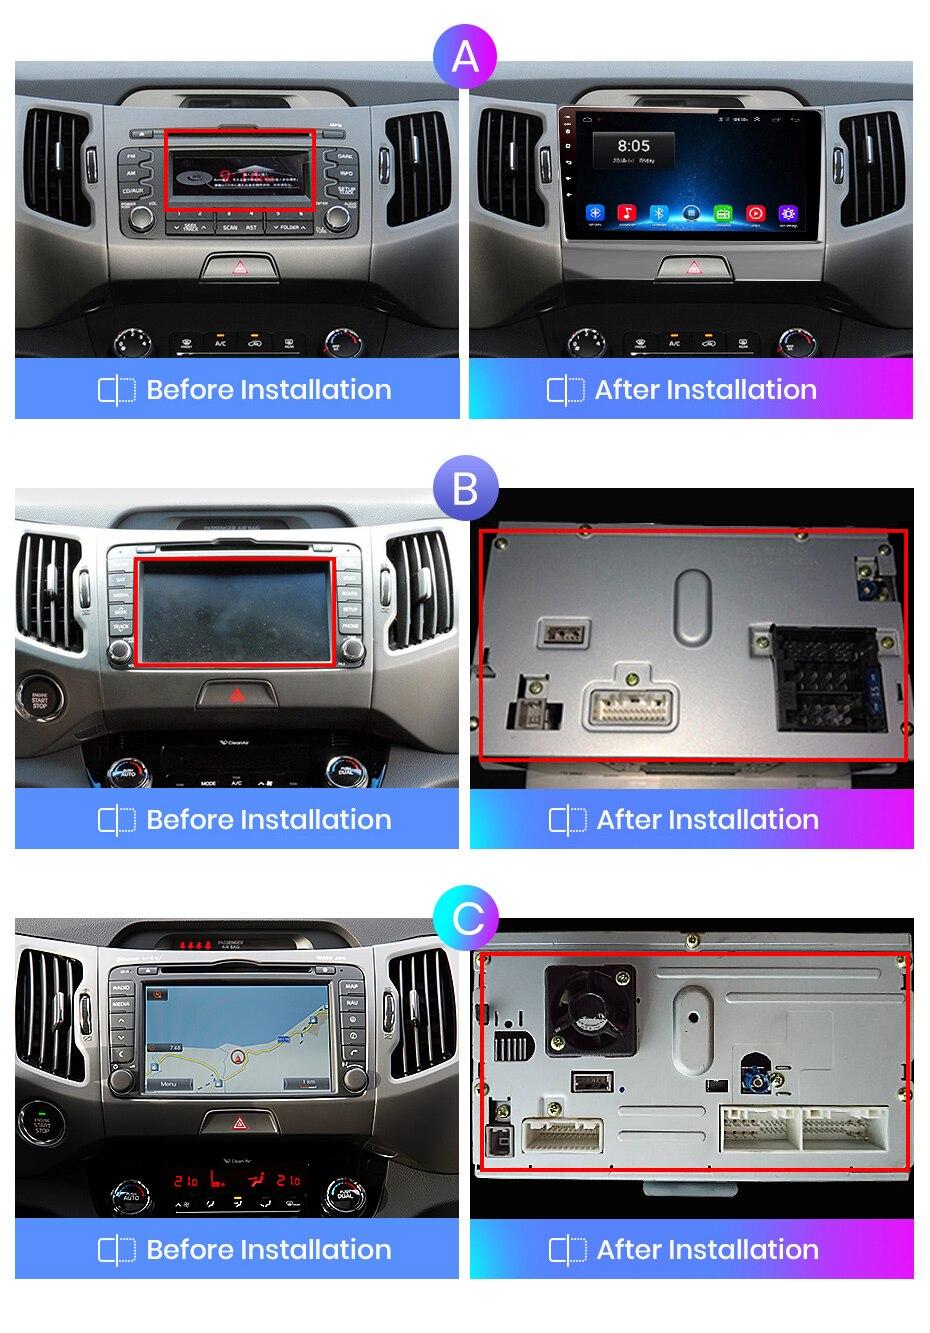 Android Auto Stereo Radio Sat NAV Doppel Din f/ür Kia Sportage 2007-2012 GPS Navigation 9 Zoll Touchscreen Head Unit Multimedia Player Videoempf/änger BT